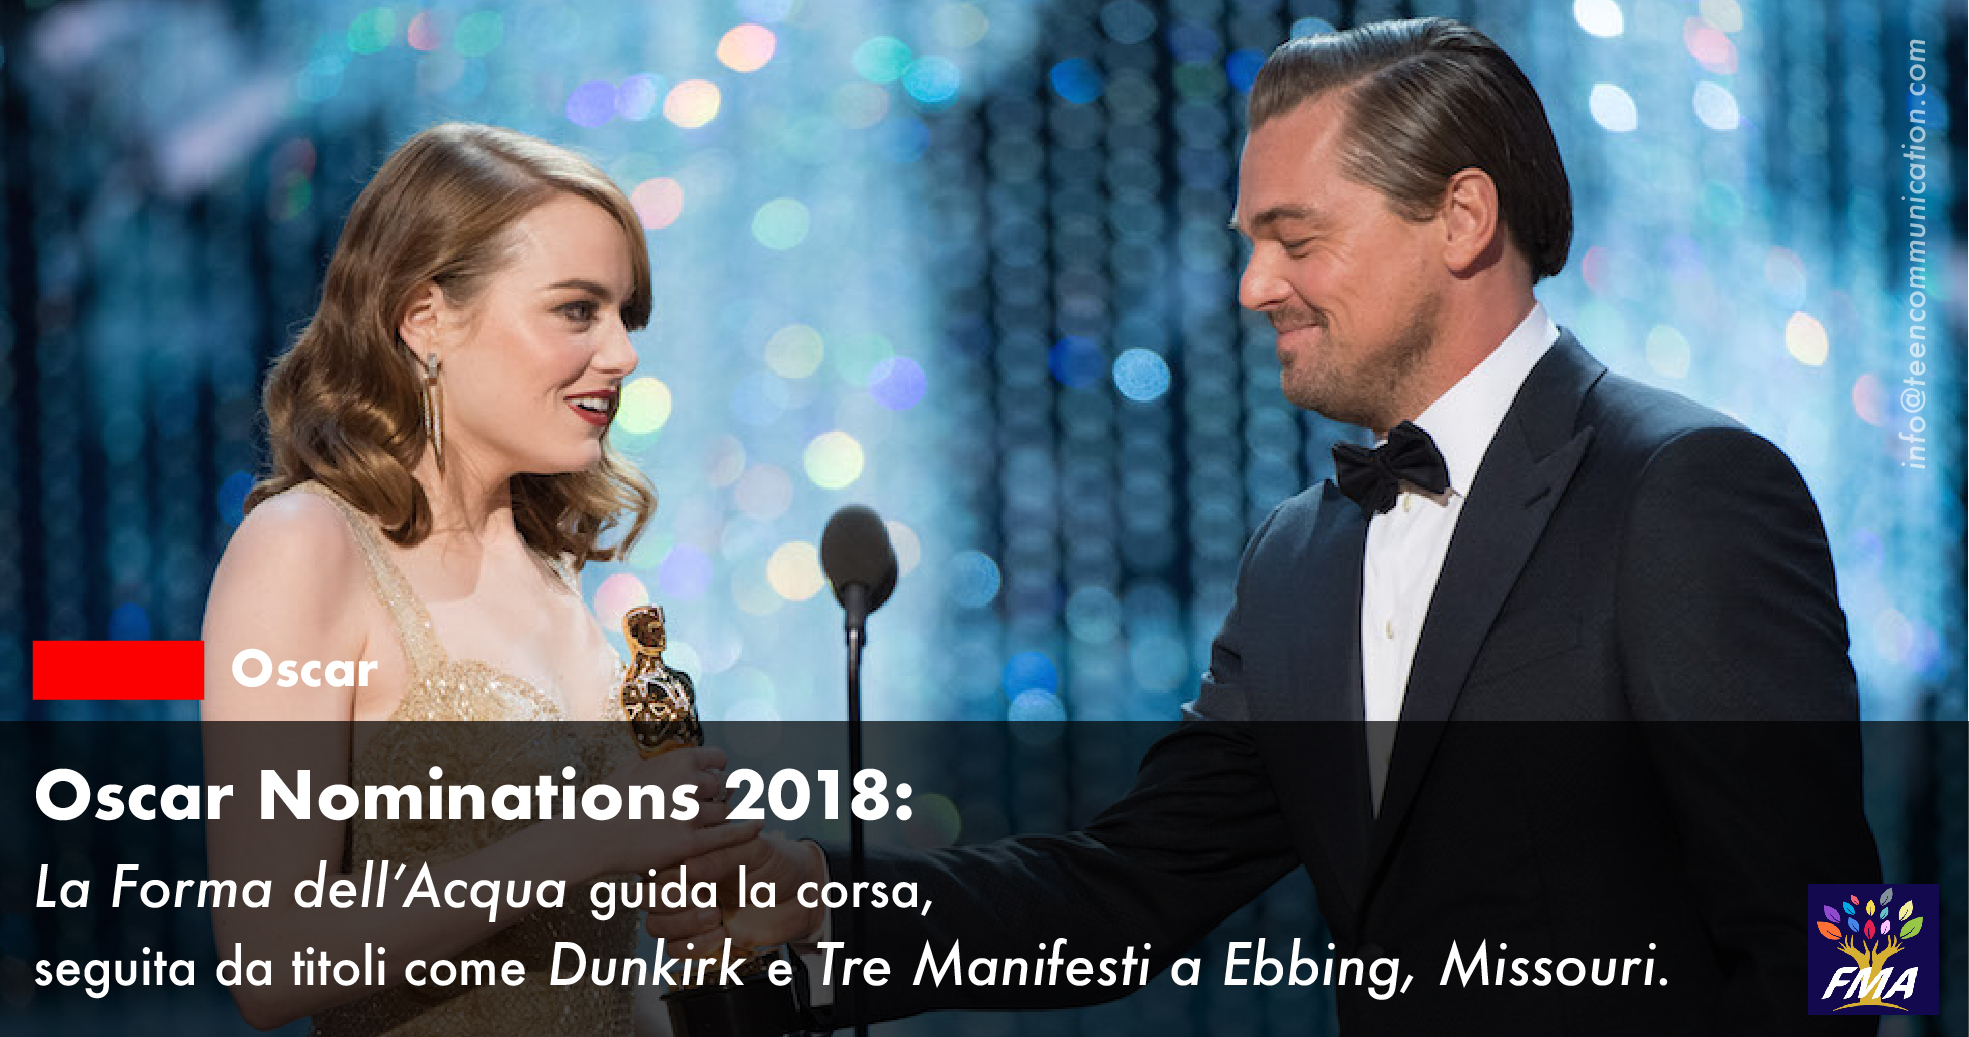 Oscar nomination 2018